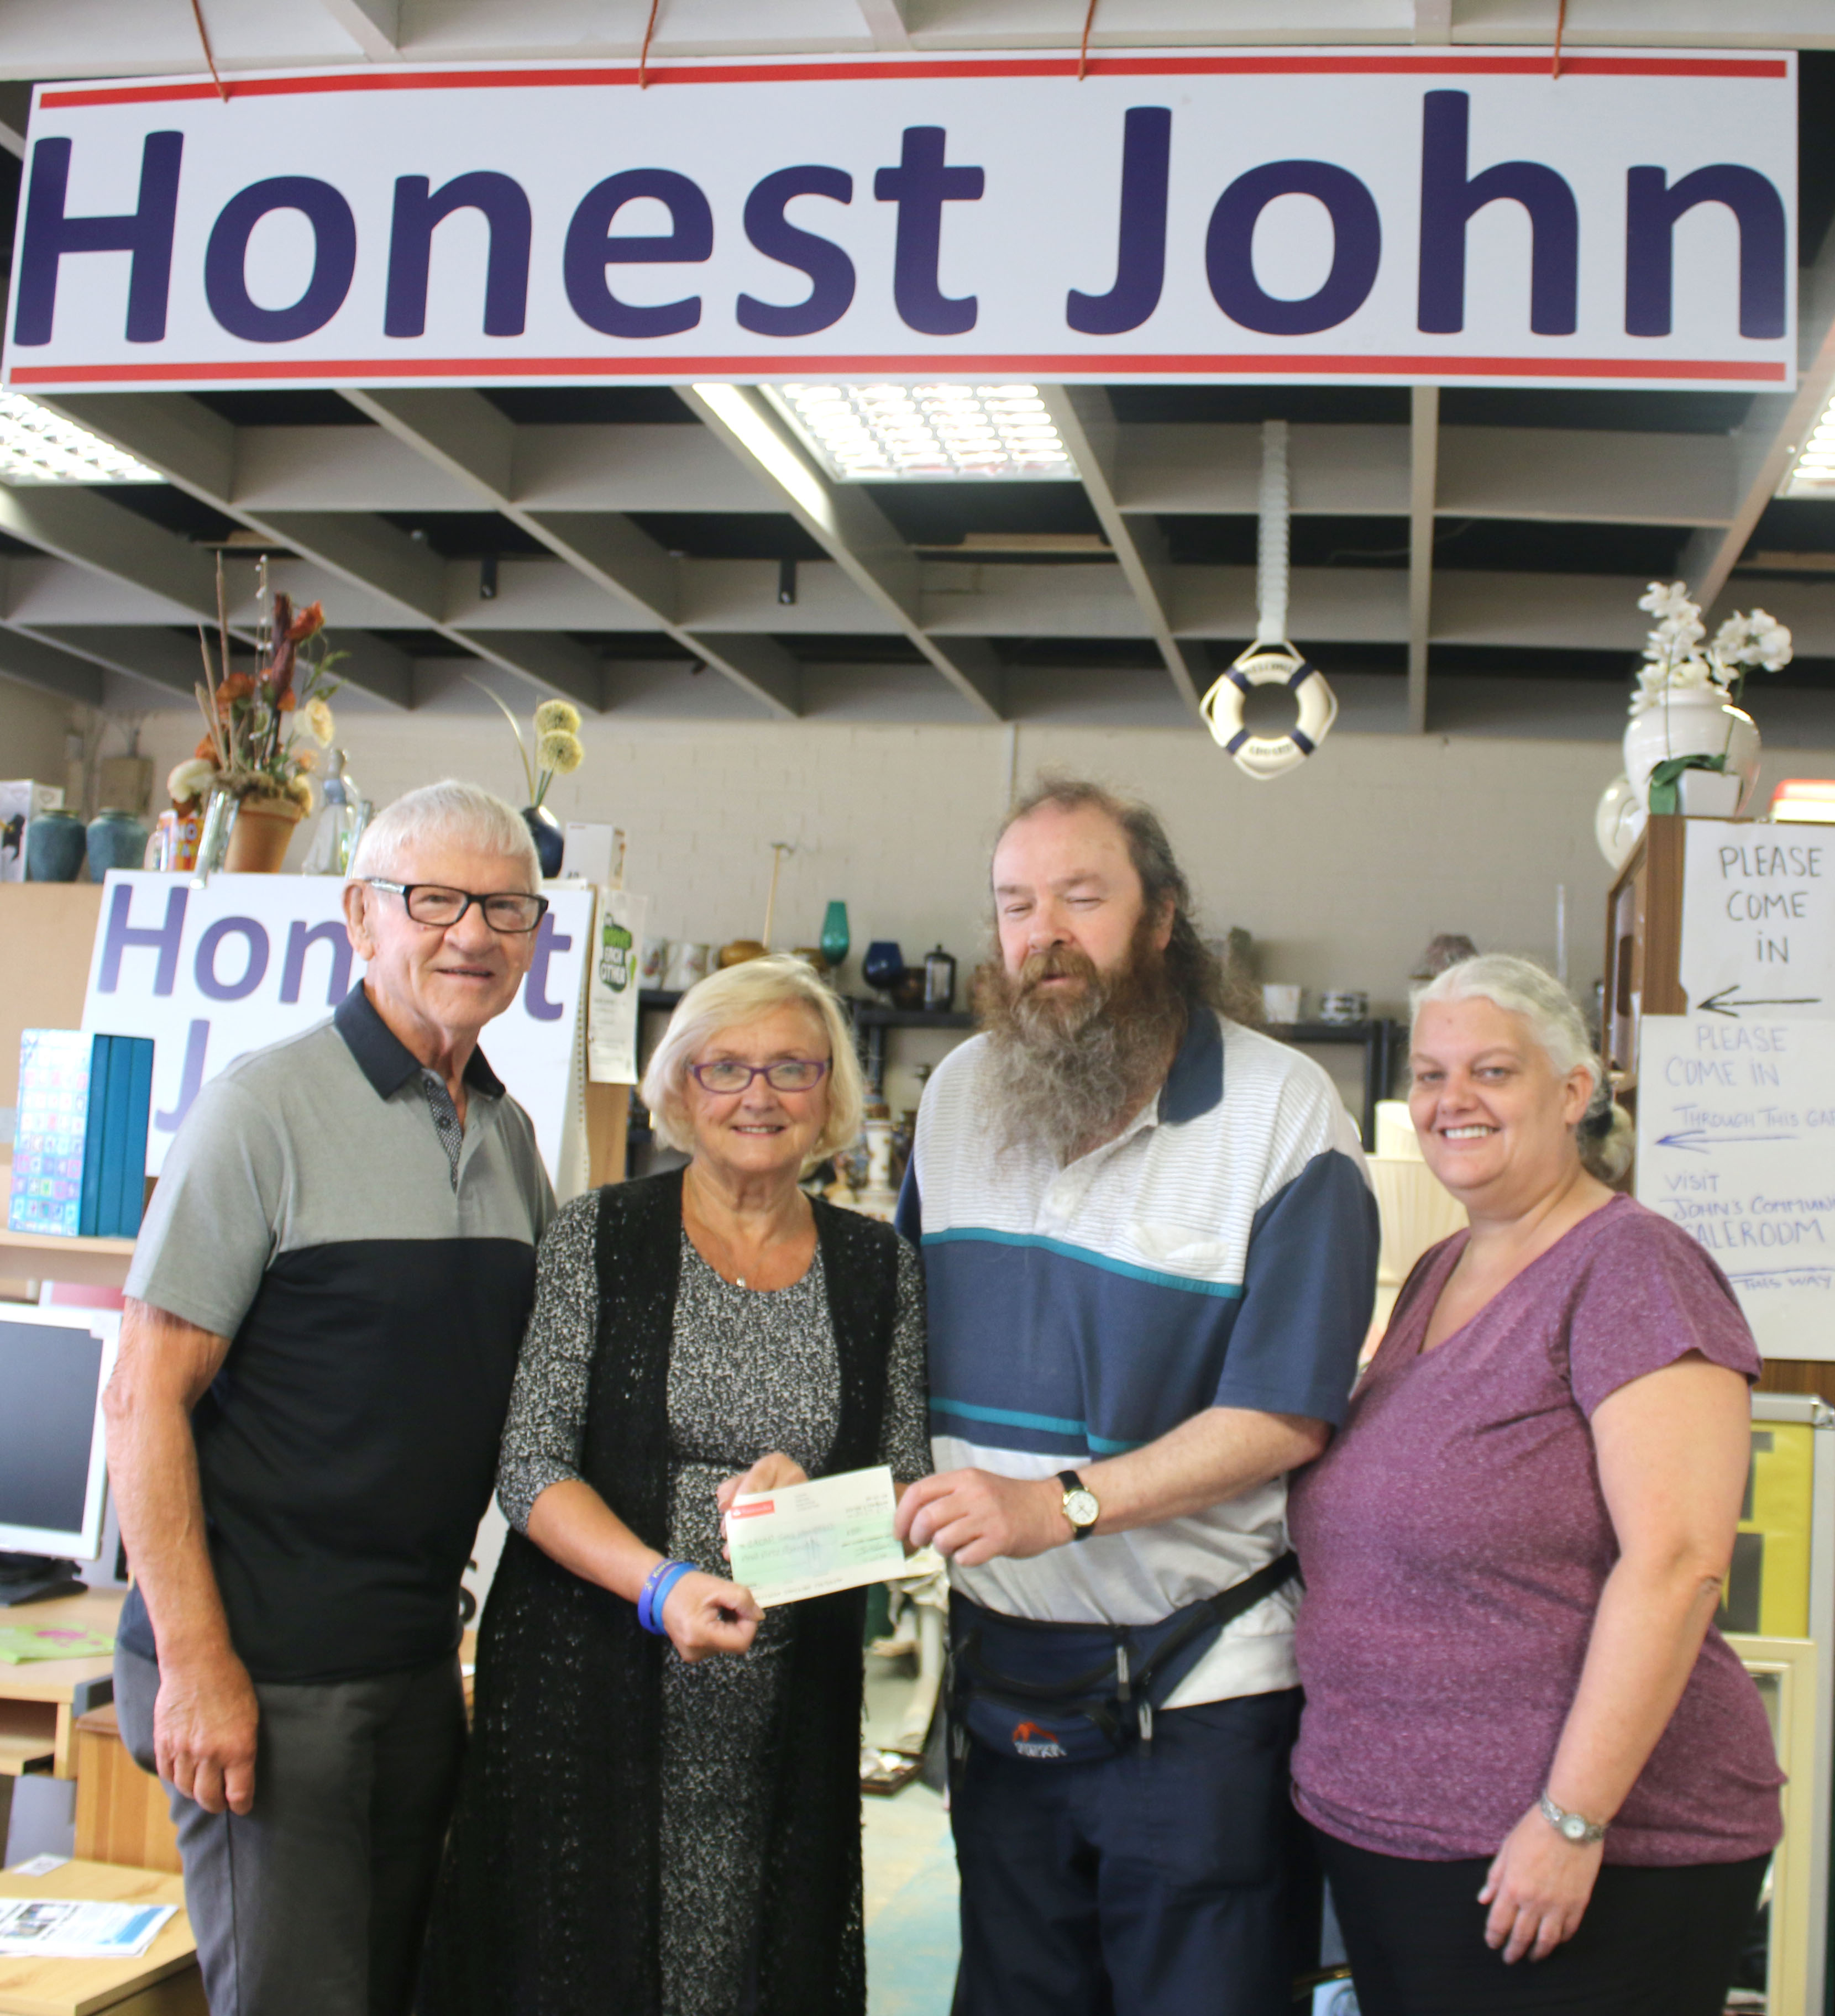 GACAP Donation from Honest John